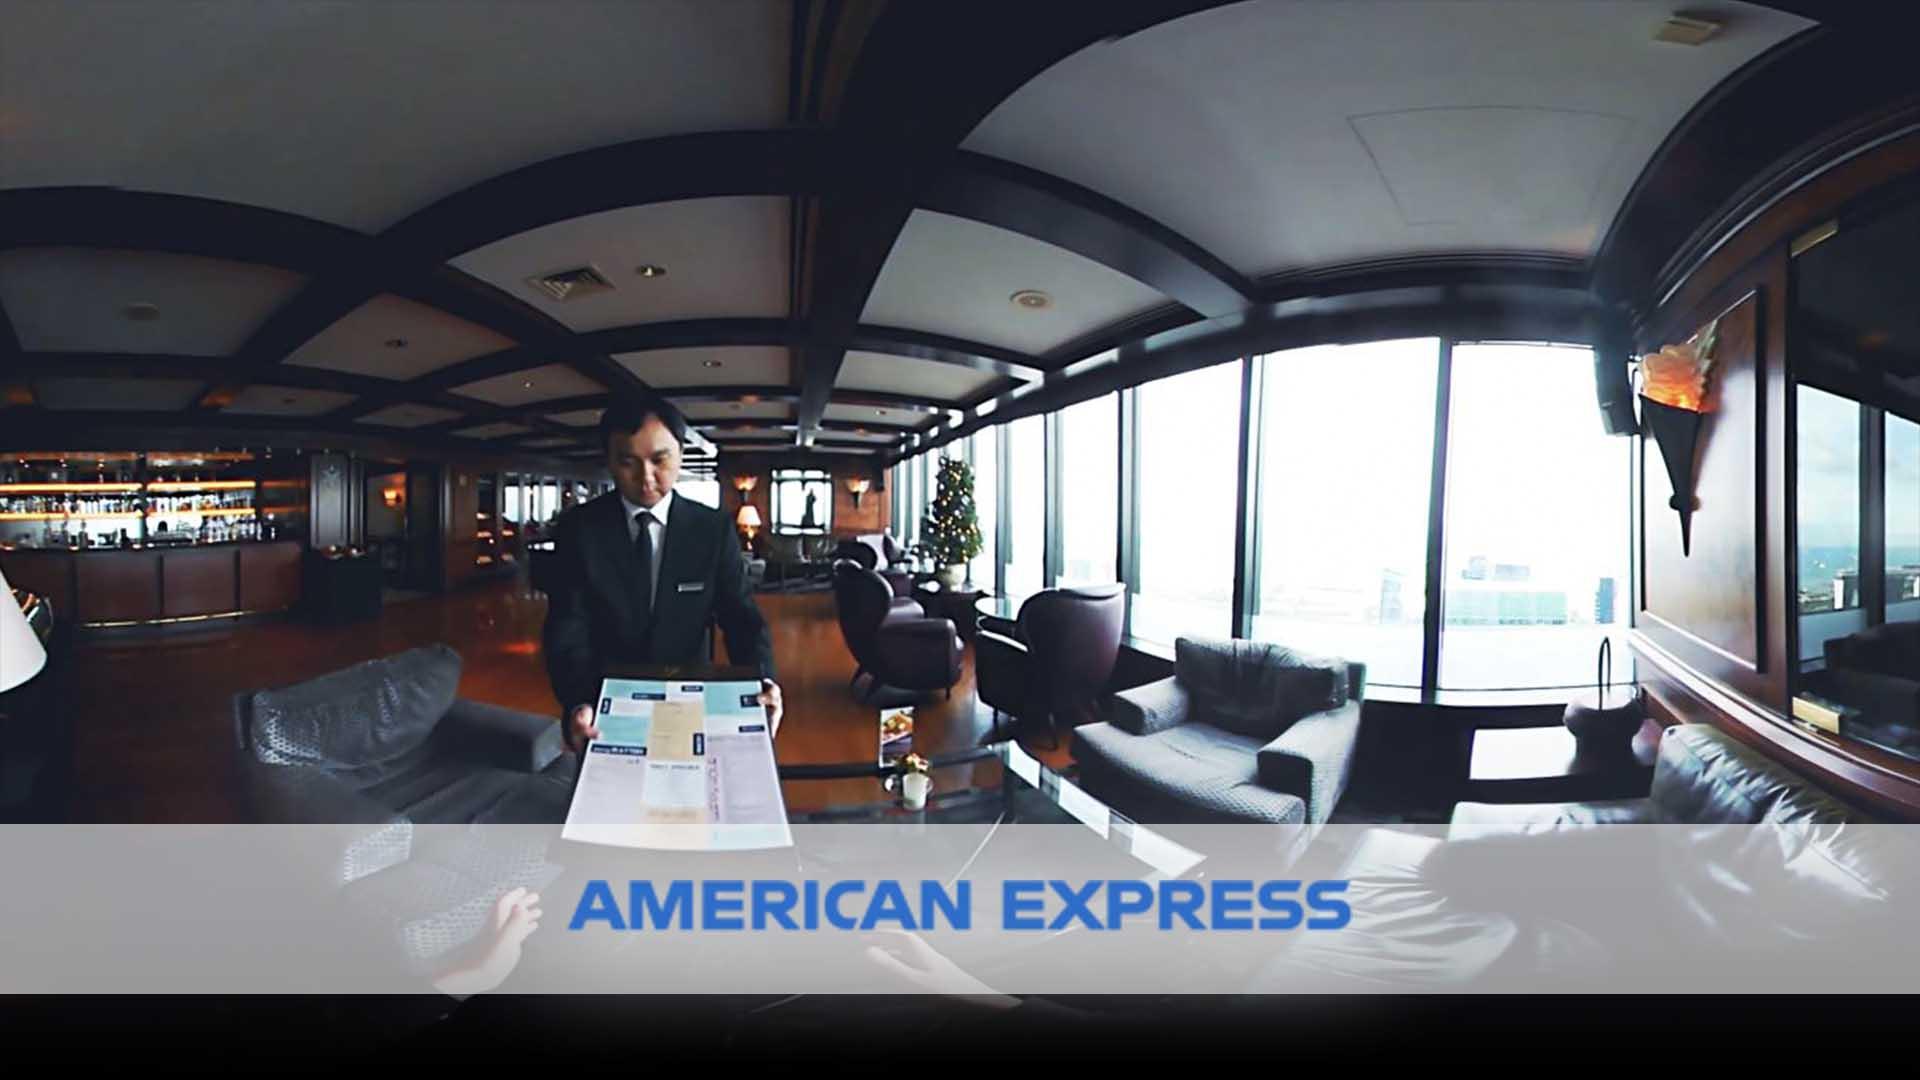 American Express Tower Club 360-degree Walkthrough